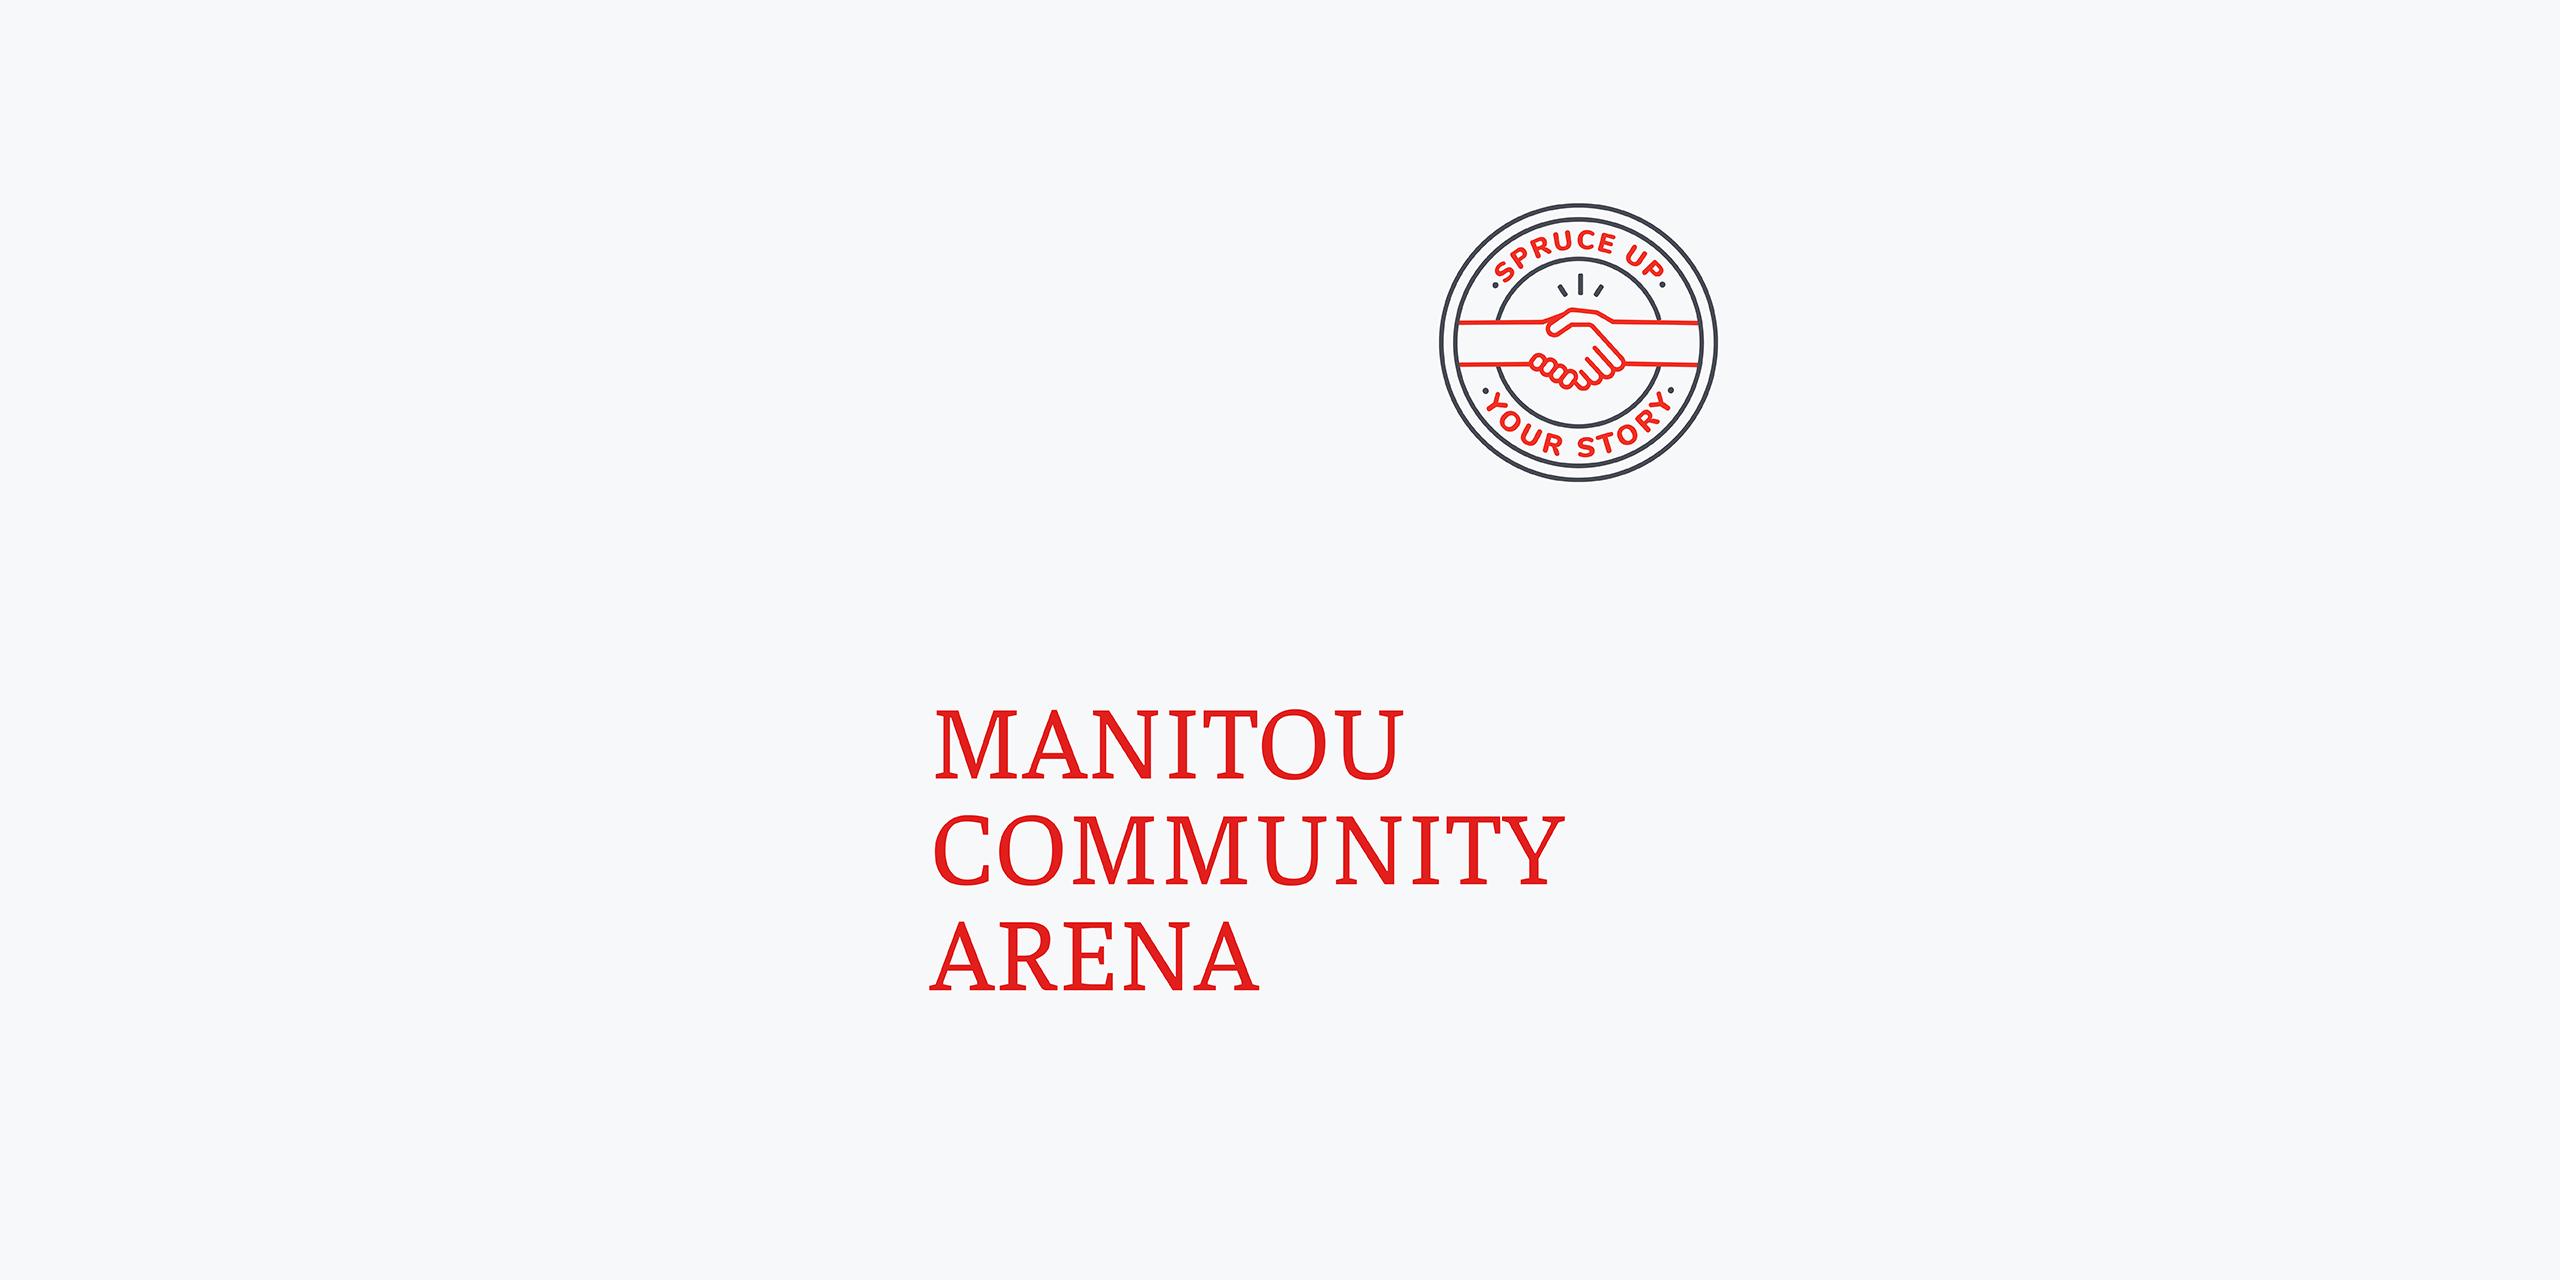 Manitou Community Arena